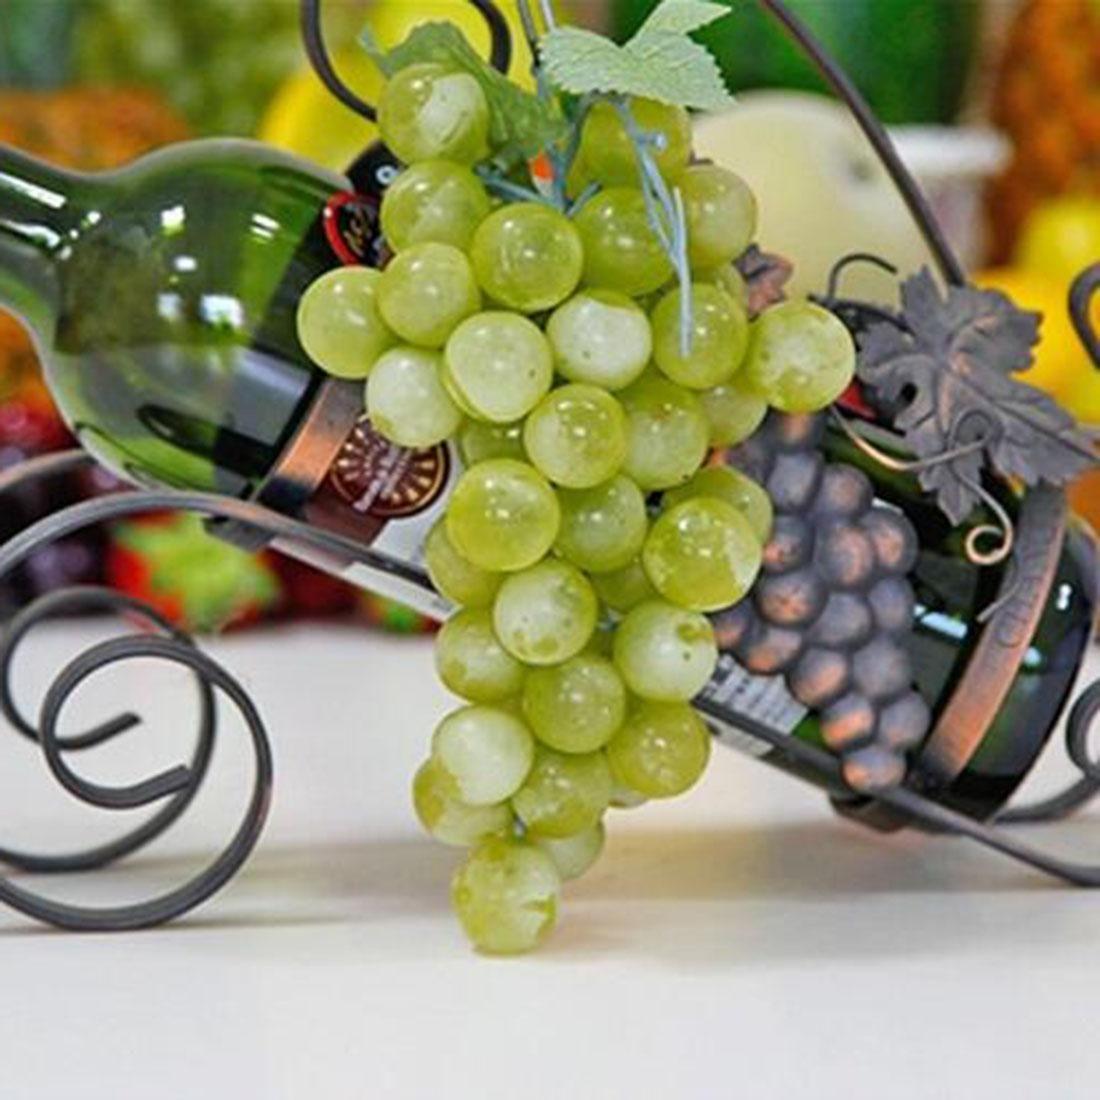 New 22 85pcs Grain Lifelike Artificial Grapes Plastic Fake Fruit Food Home  Decor Decoration Vivid Fake Grapes Green